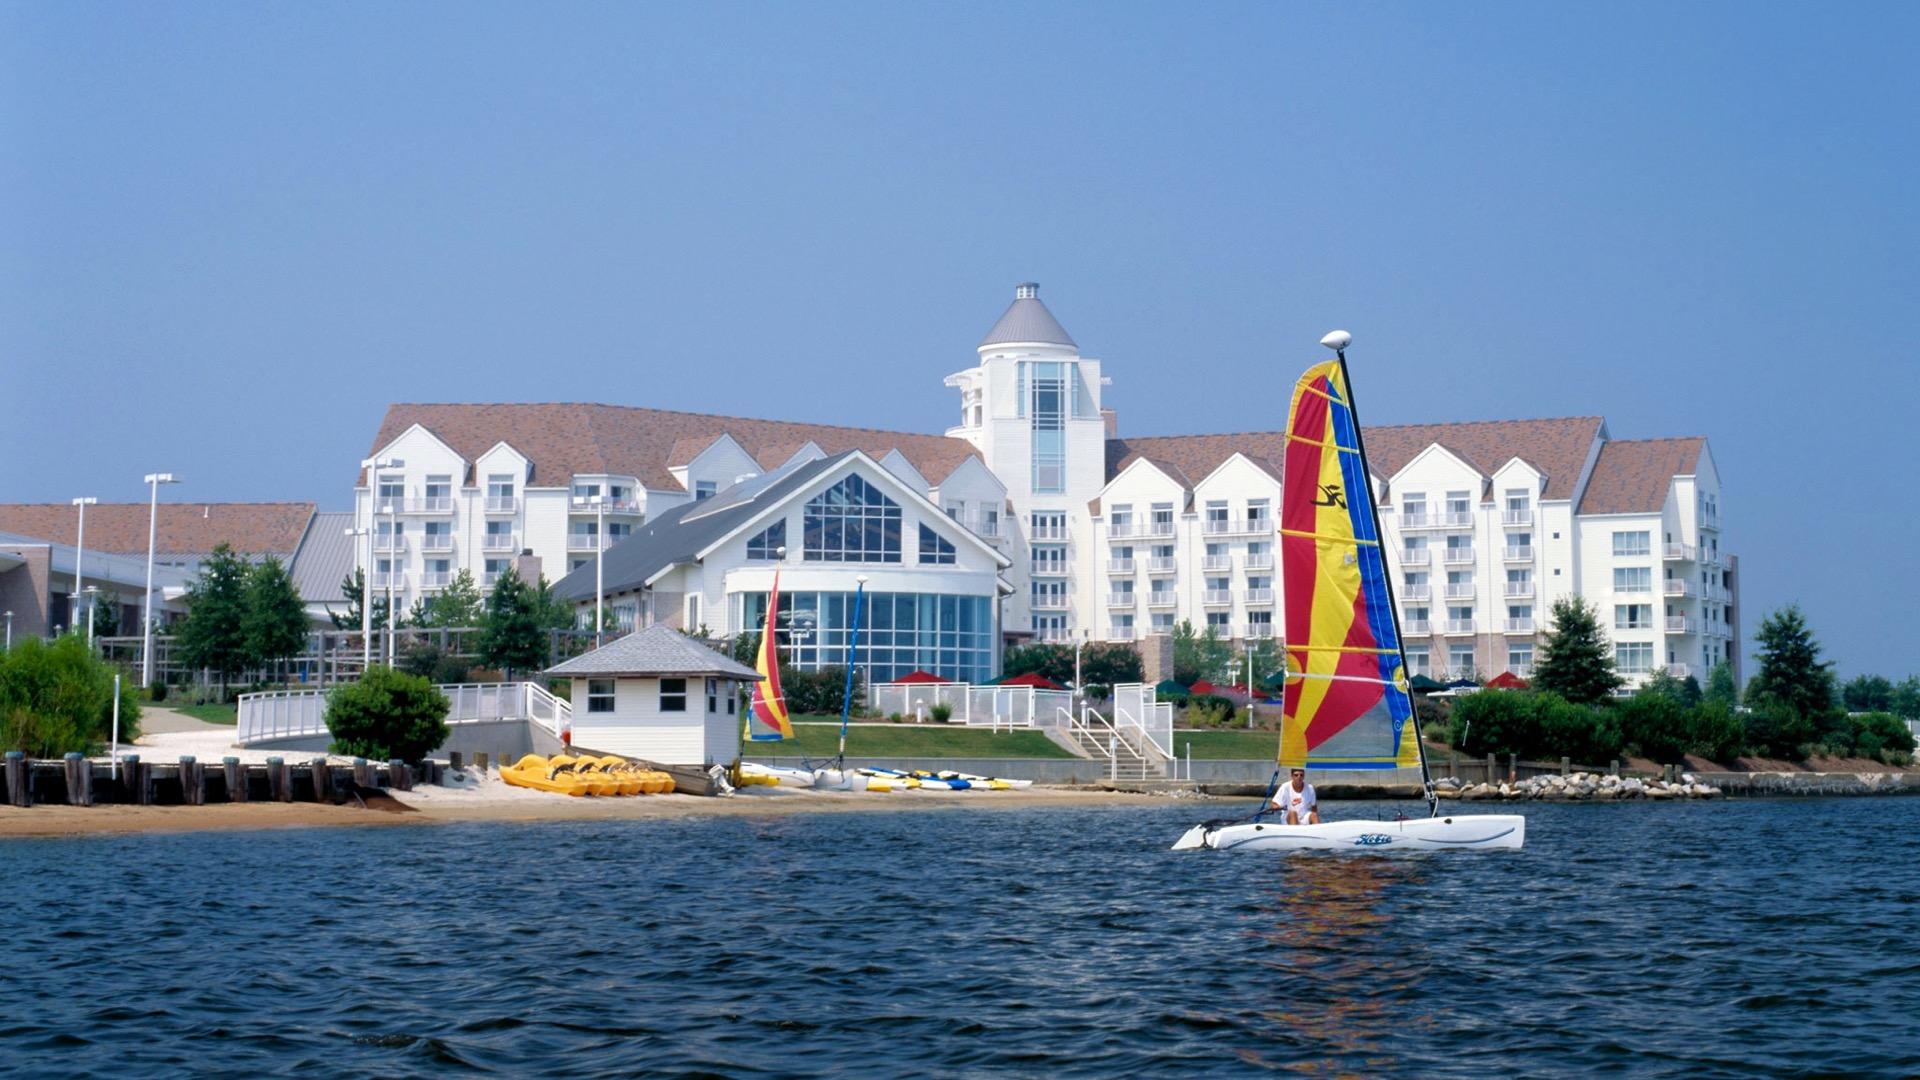 sago spa hyatt regency chesapeake bay resort spas of. Black Bedroom Furniture Sets. Home Design Ideas